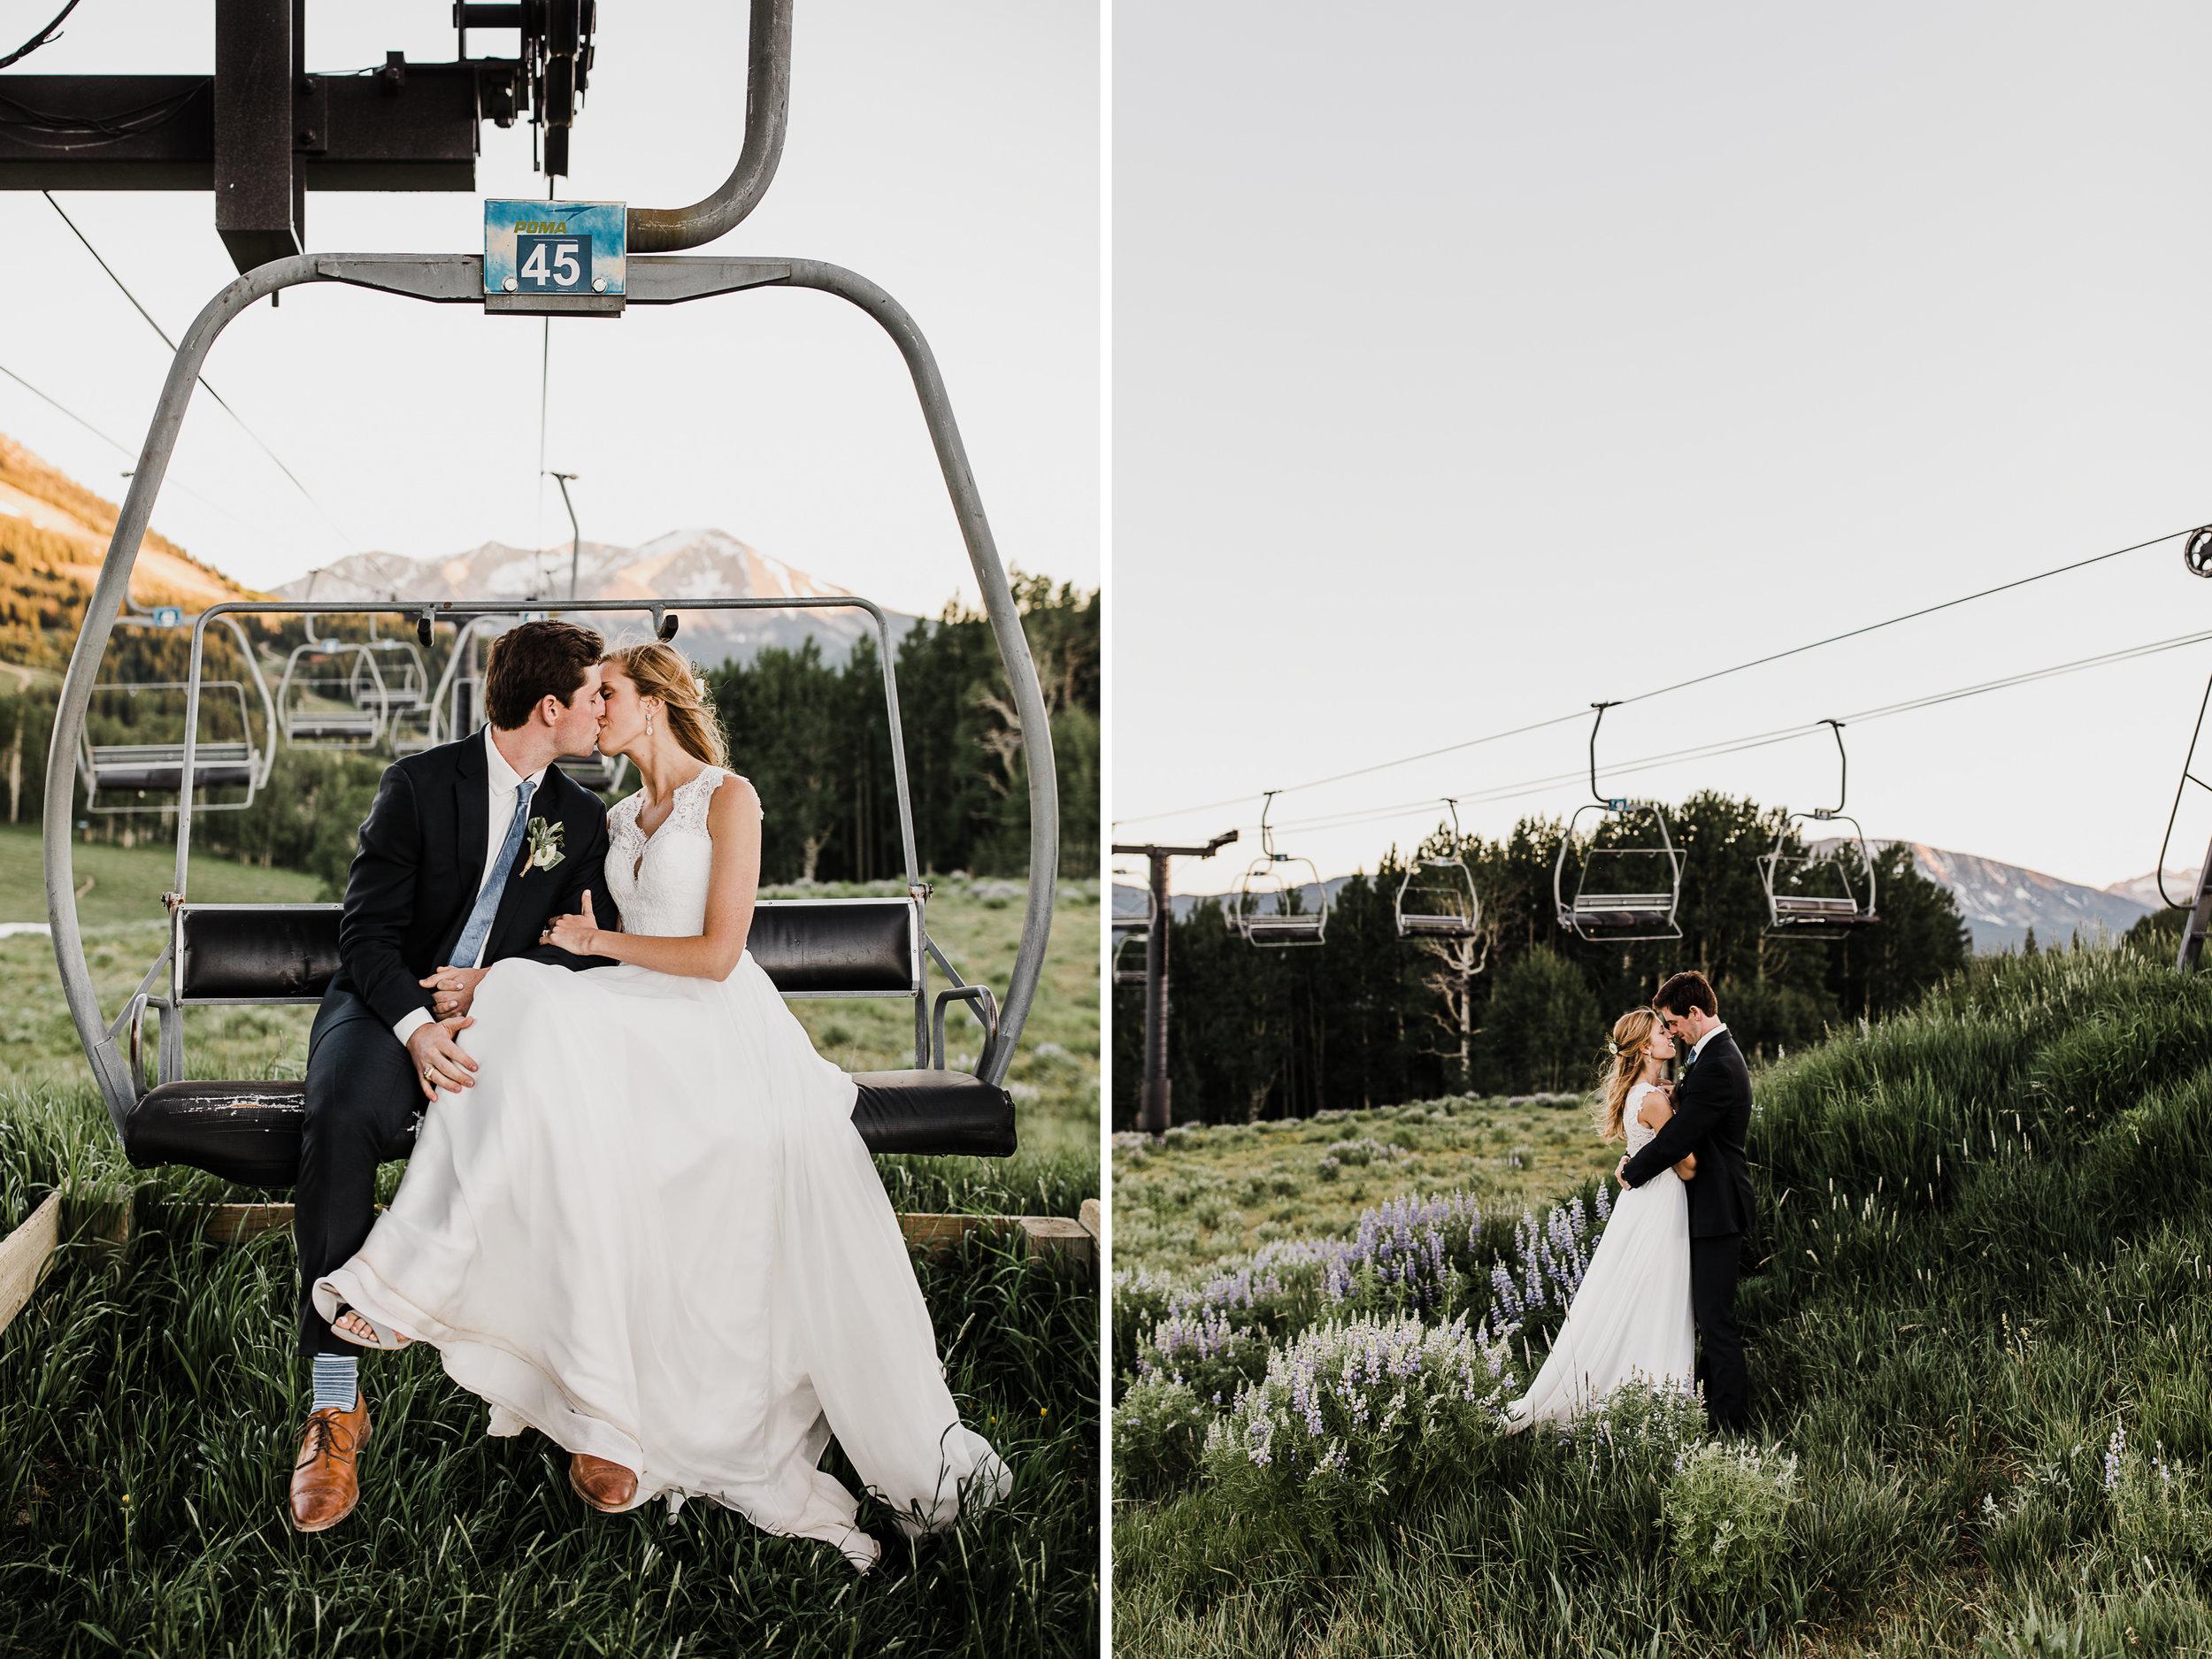 created butte, colorado intimate ski resort wedding | destination adventure wedding photographers | the hearnes adventure photography | www.thehearnes.com